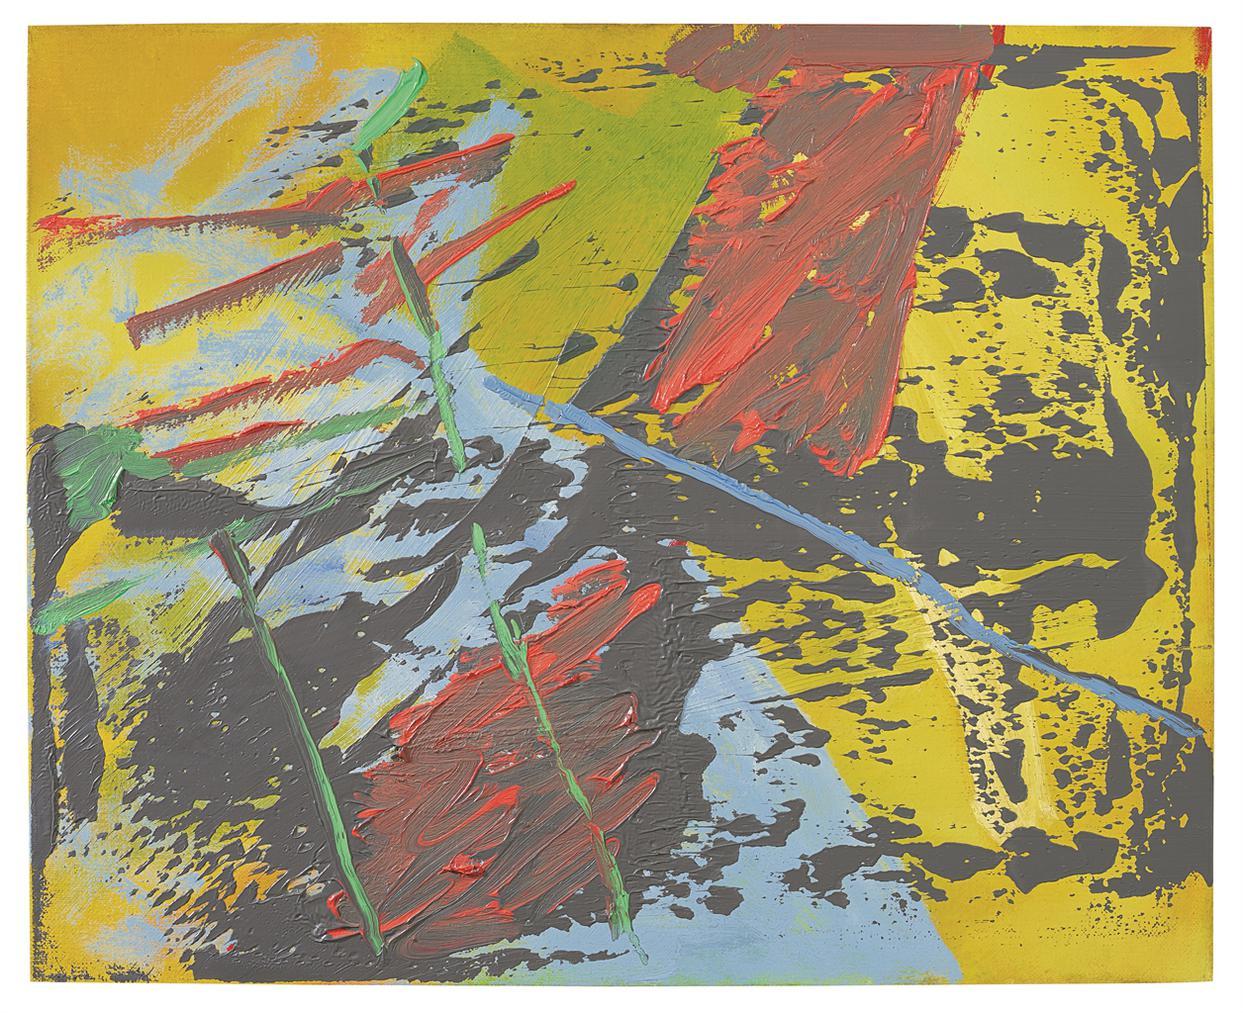 Gerhard Richter-Abstraktes Bild-1981